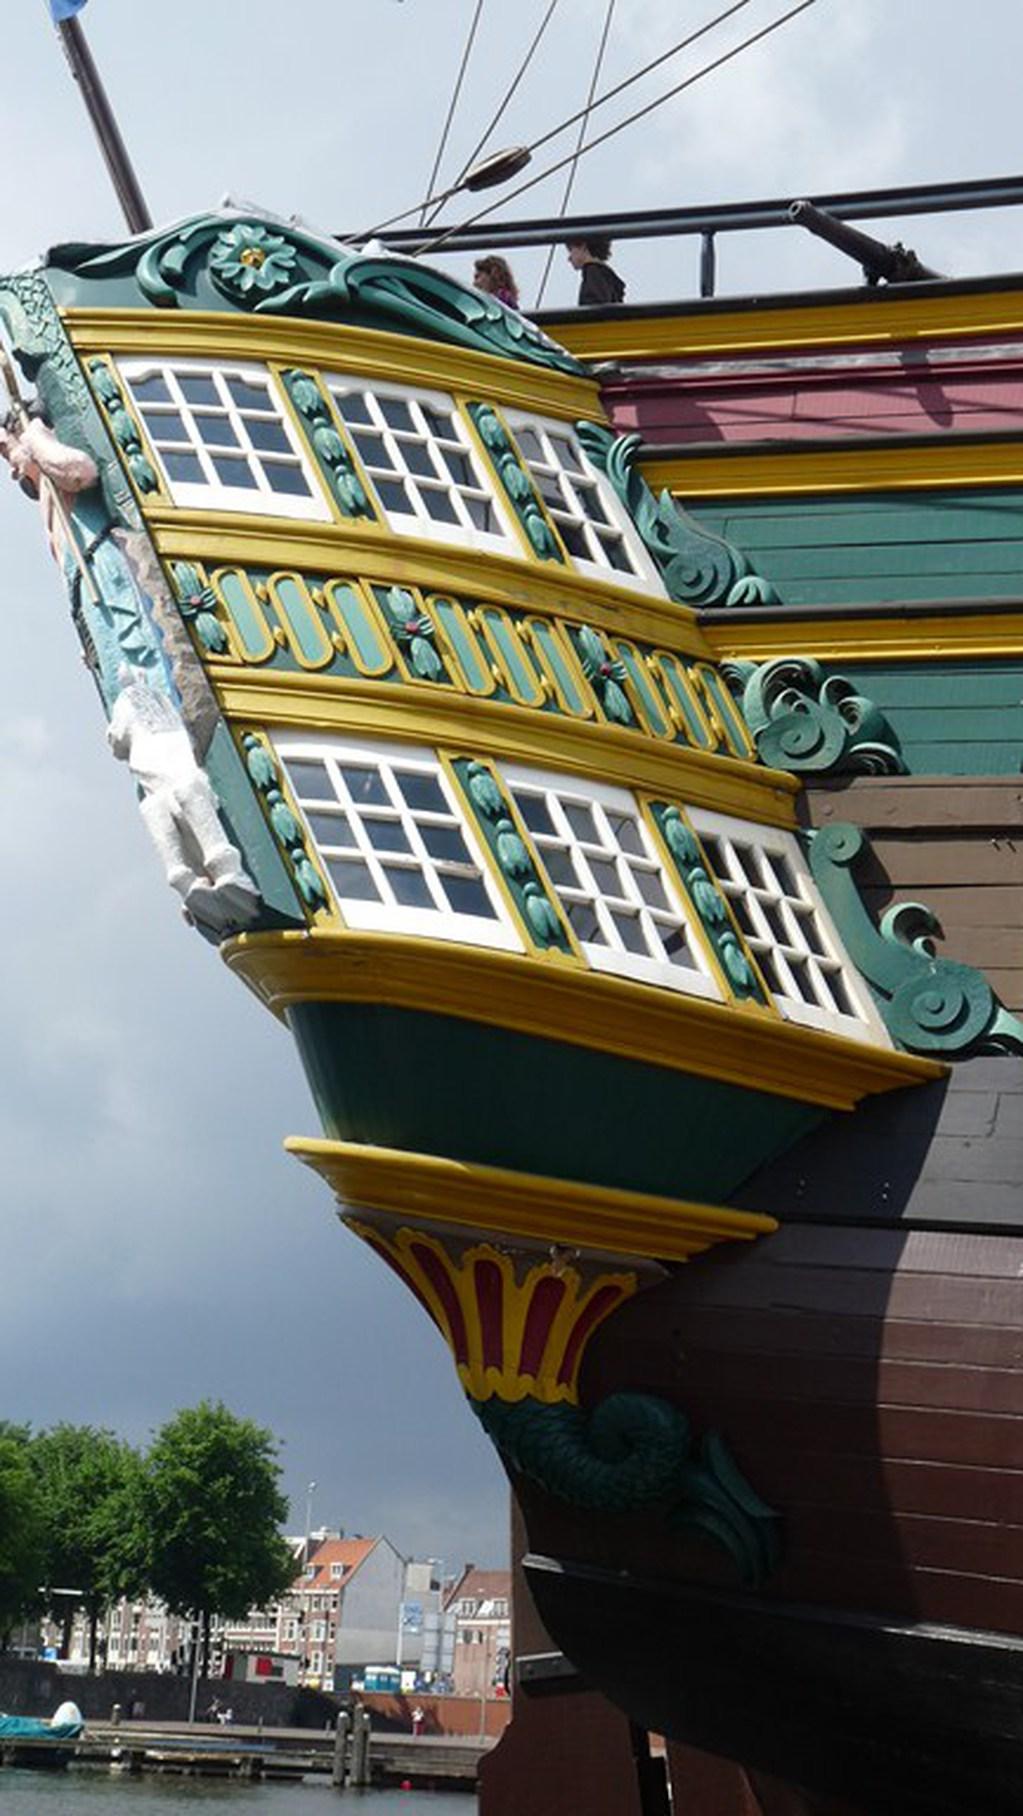 Visite du VOC « AMSTERDAM » (1749) à Amsterdam 17072807440523134915176663